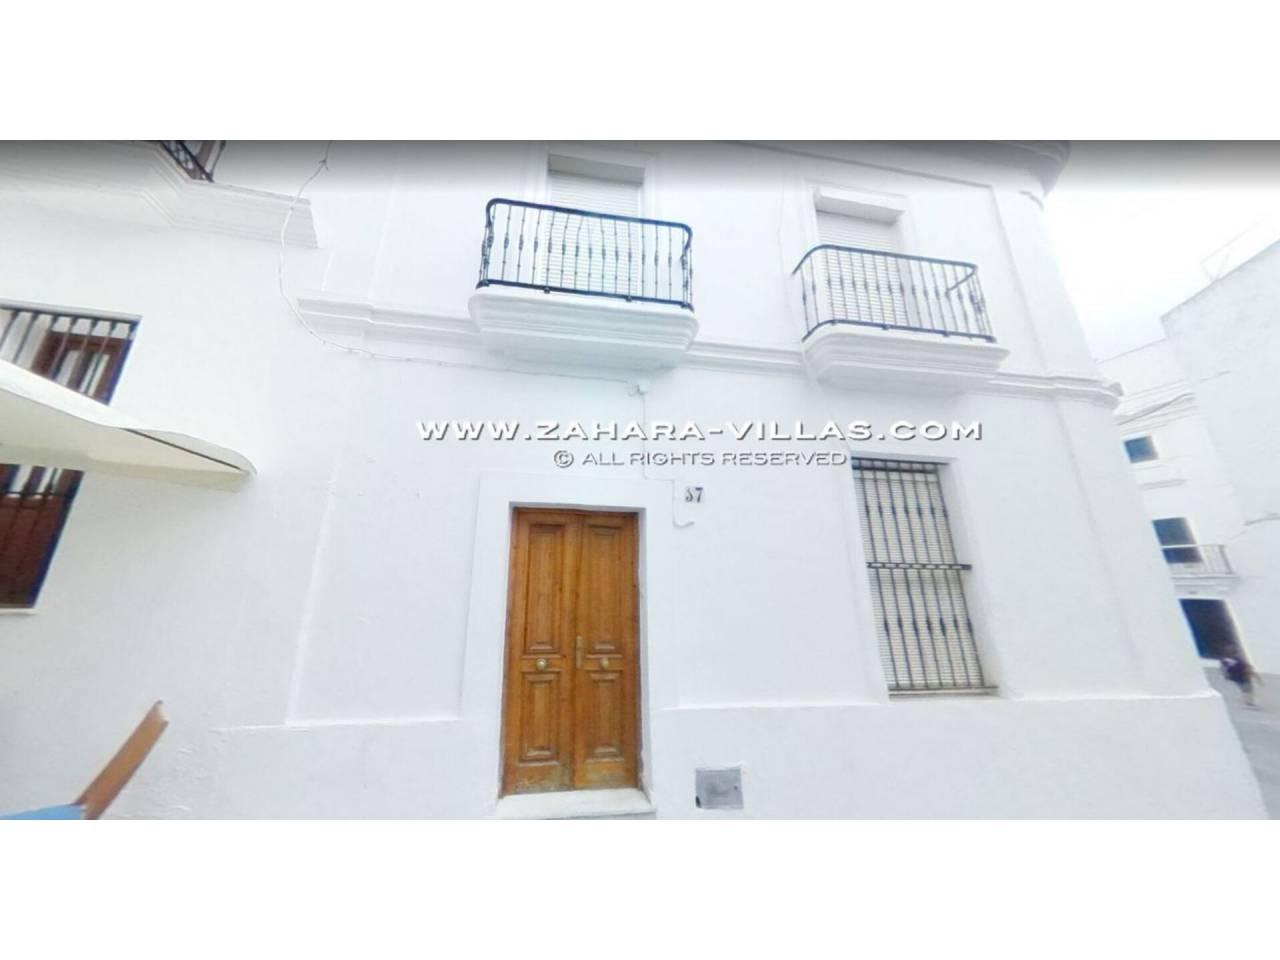 Imagen 22 de House for sale located in pedestrian street of Vejer de la Frontera